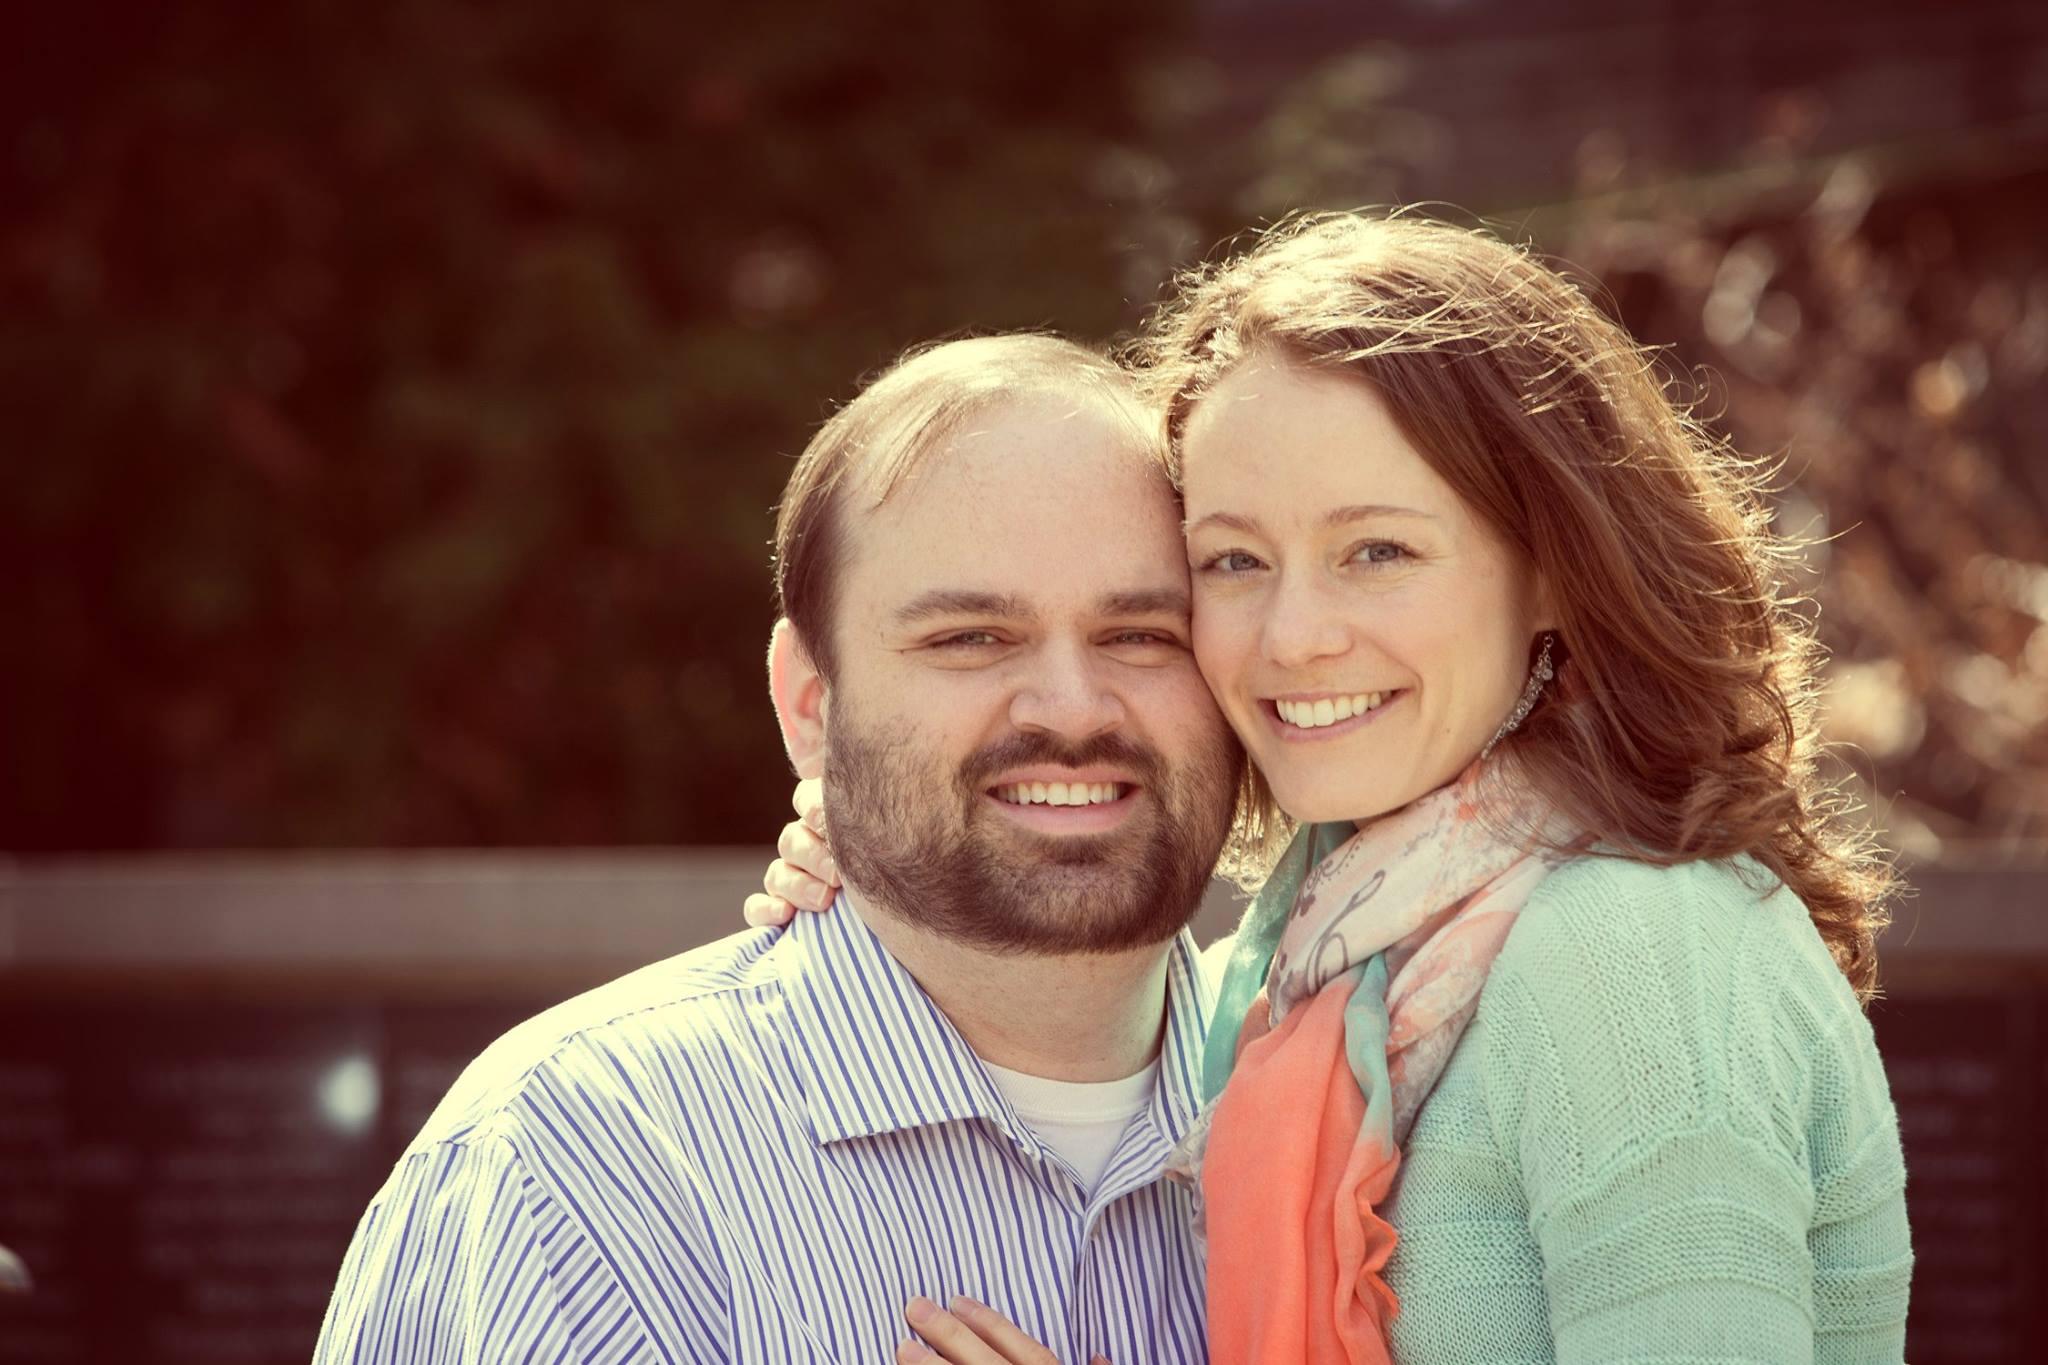 Ryan and Amanda - family ready to adopt in Ohio at Spirit of Faith Adoptions